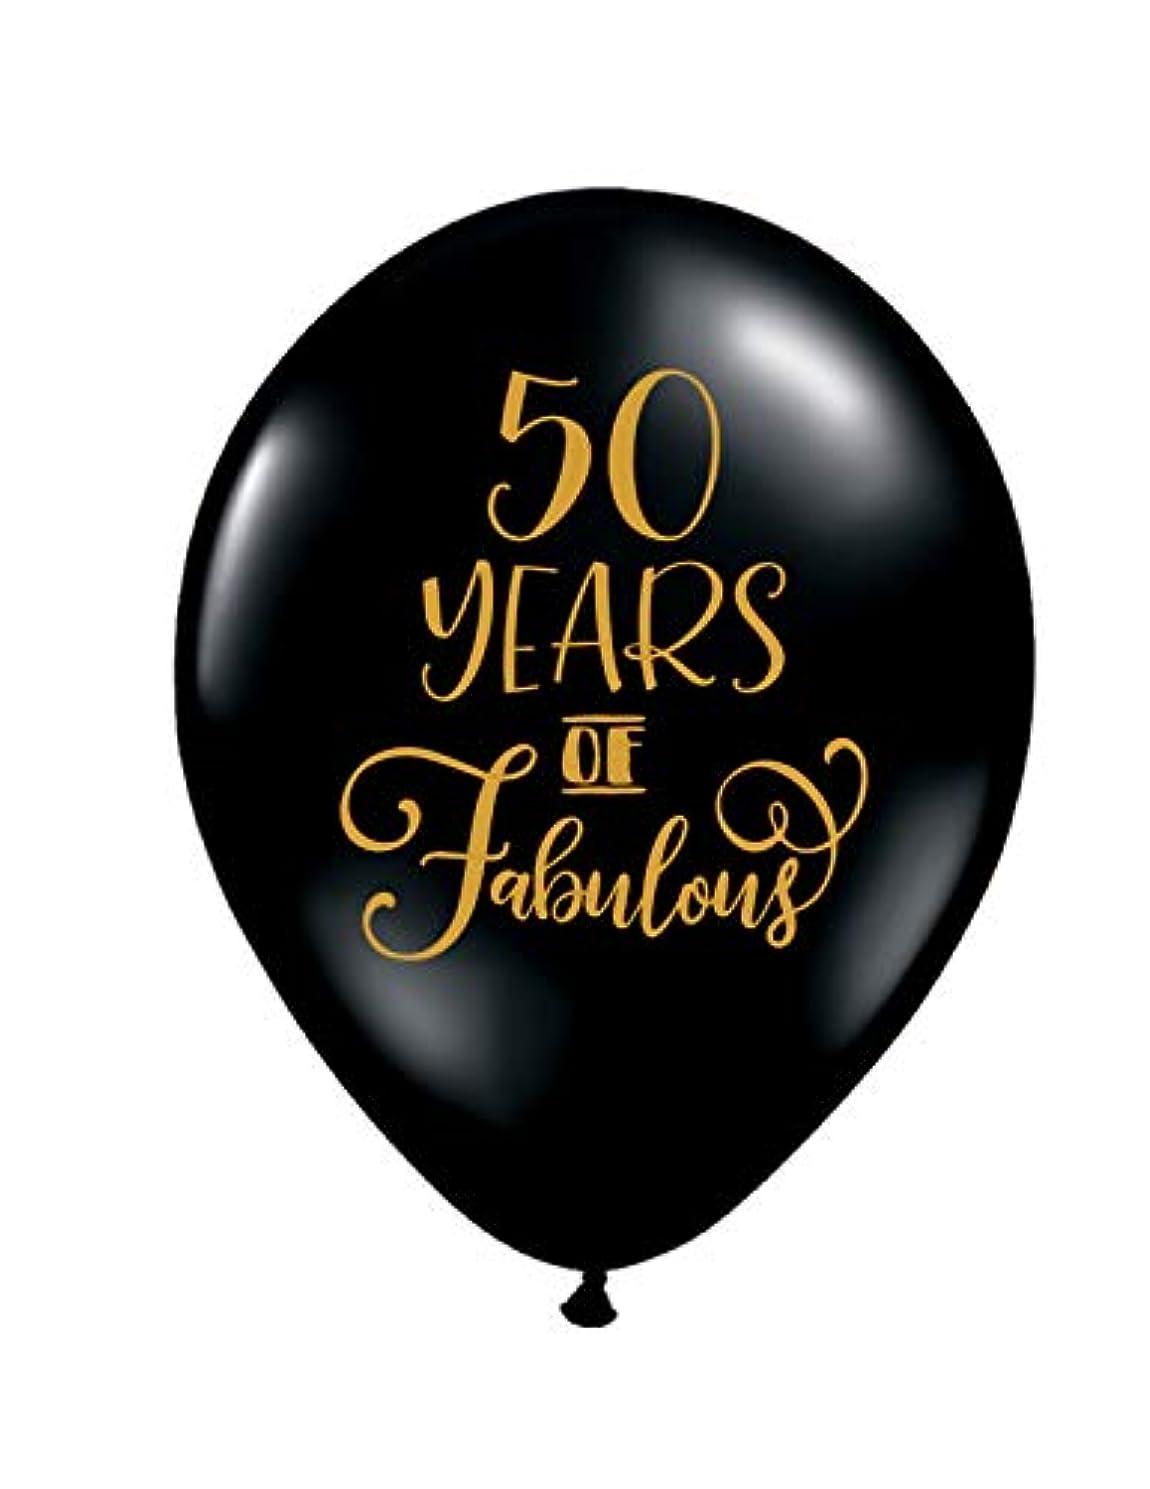 50 Years of Fabulous Black Balloons - 50th Birthday Balloons - Set of 3